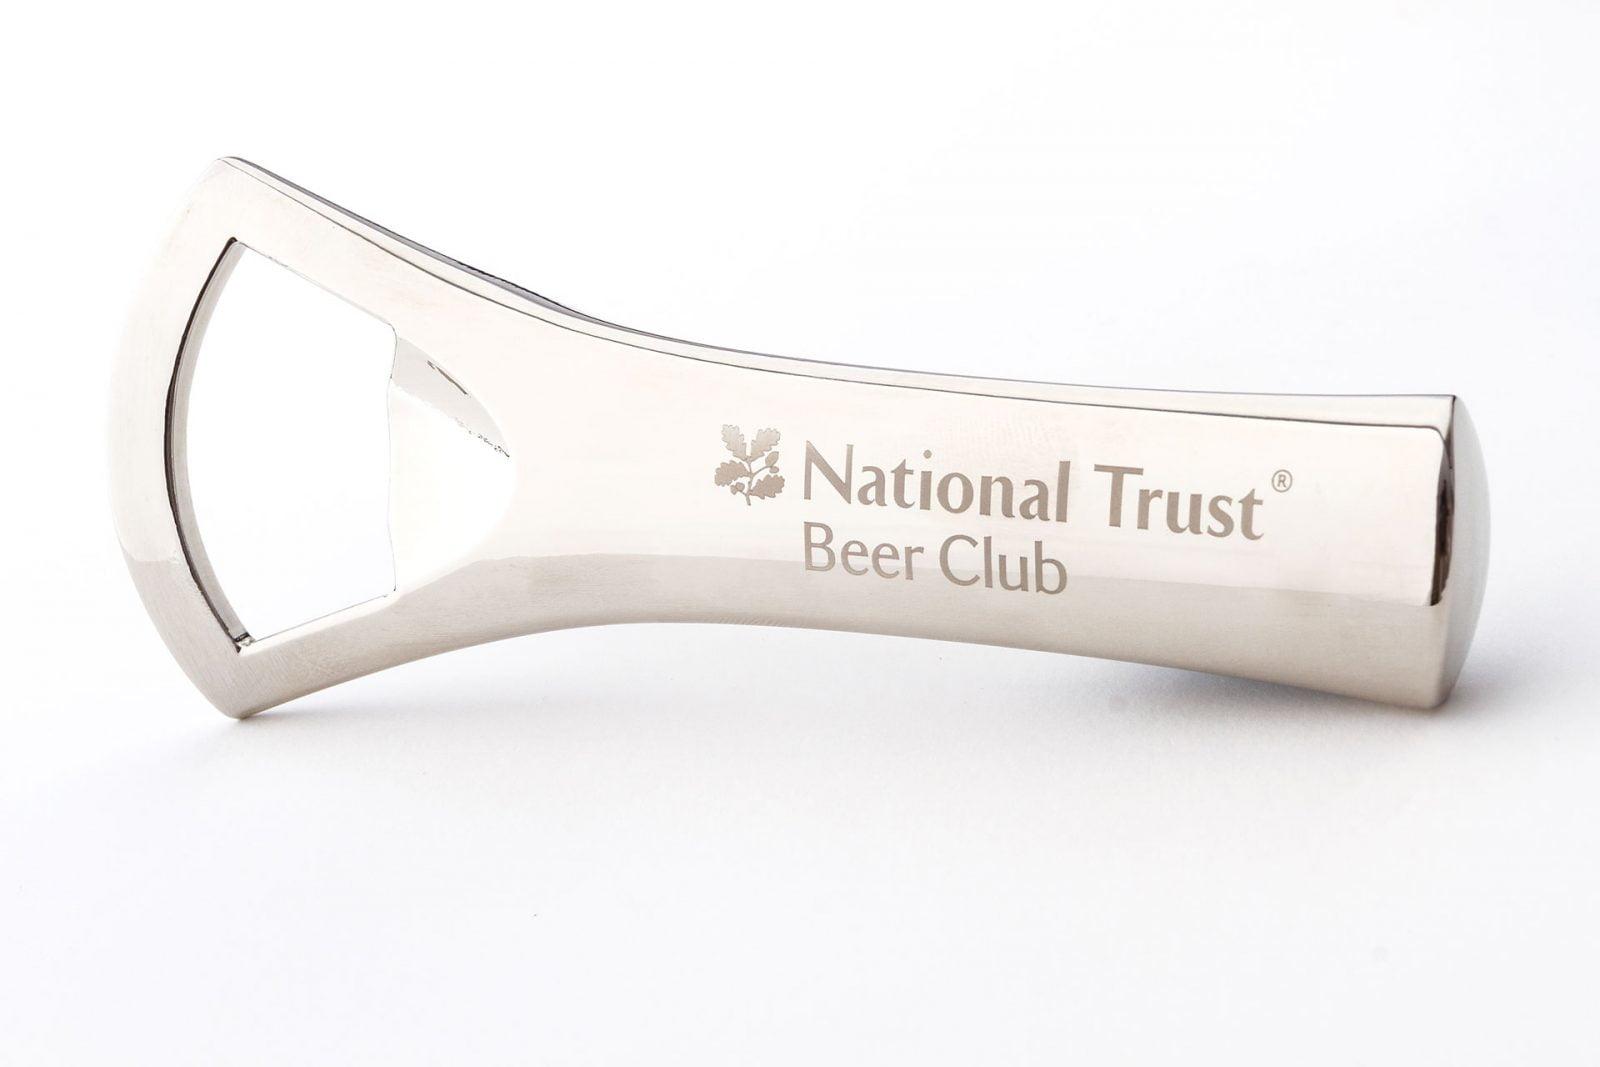 National Trust Beer Club